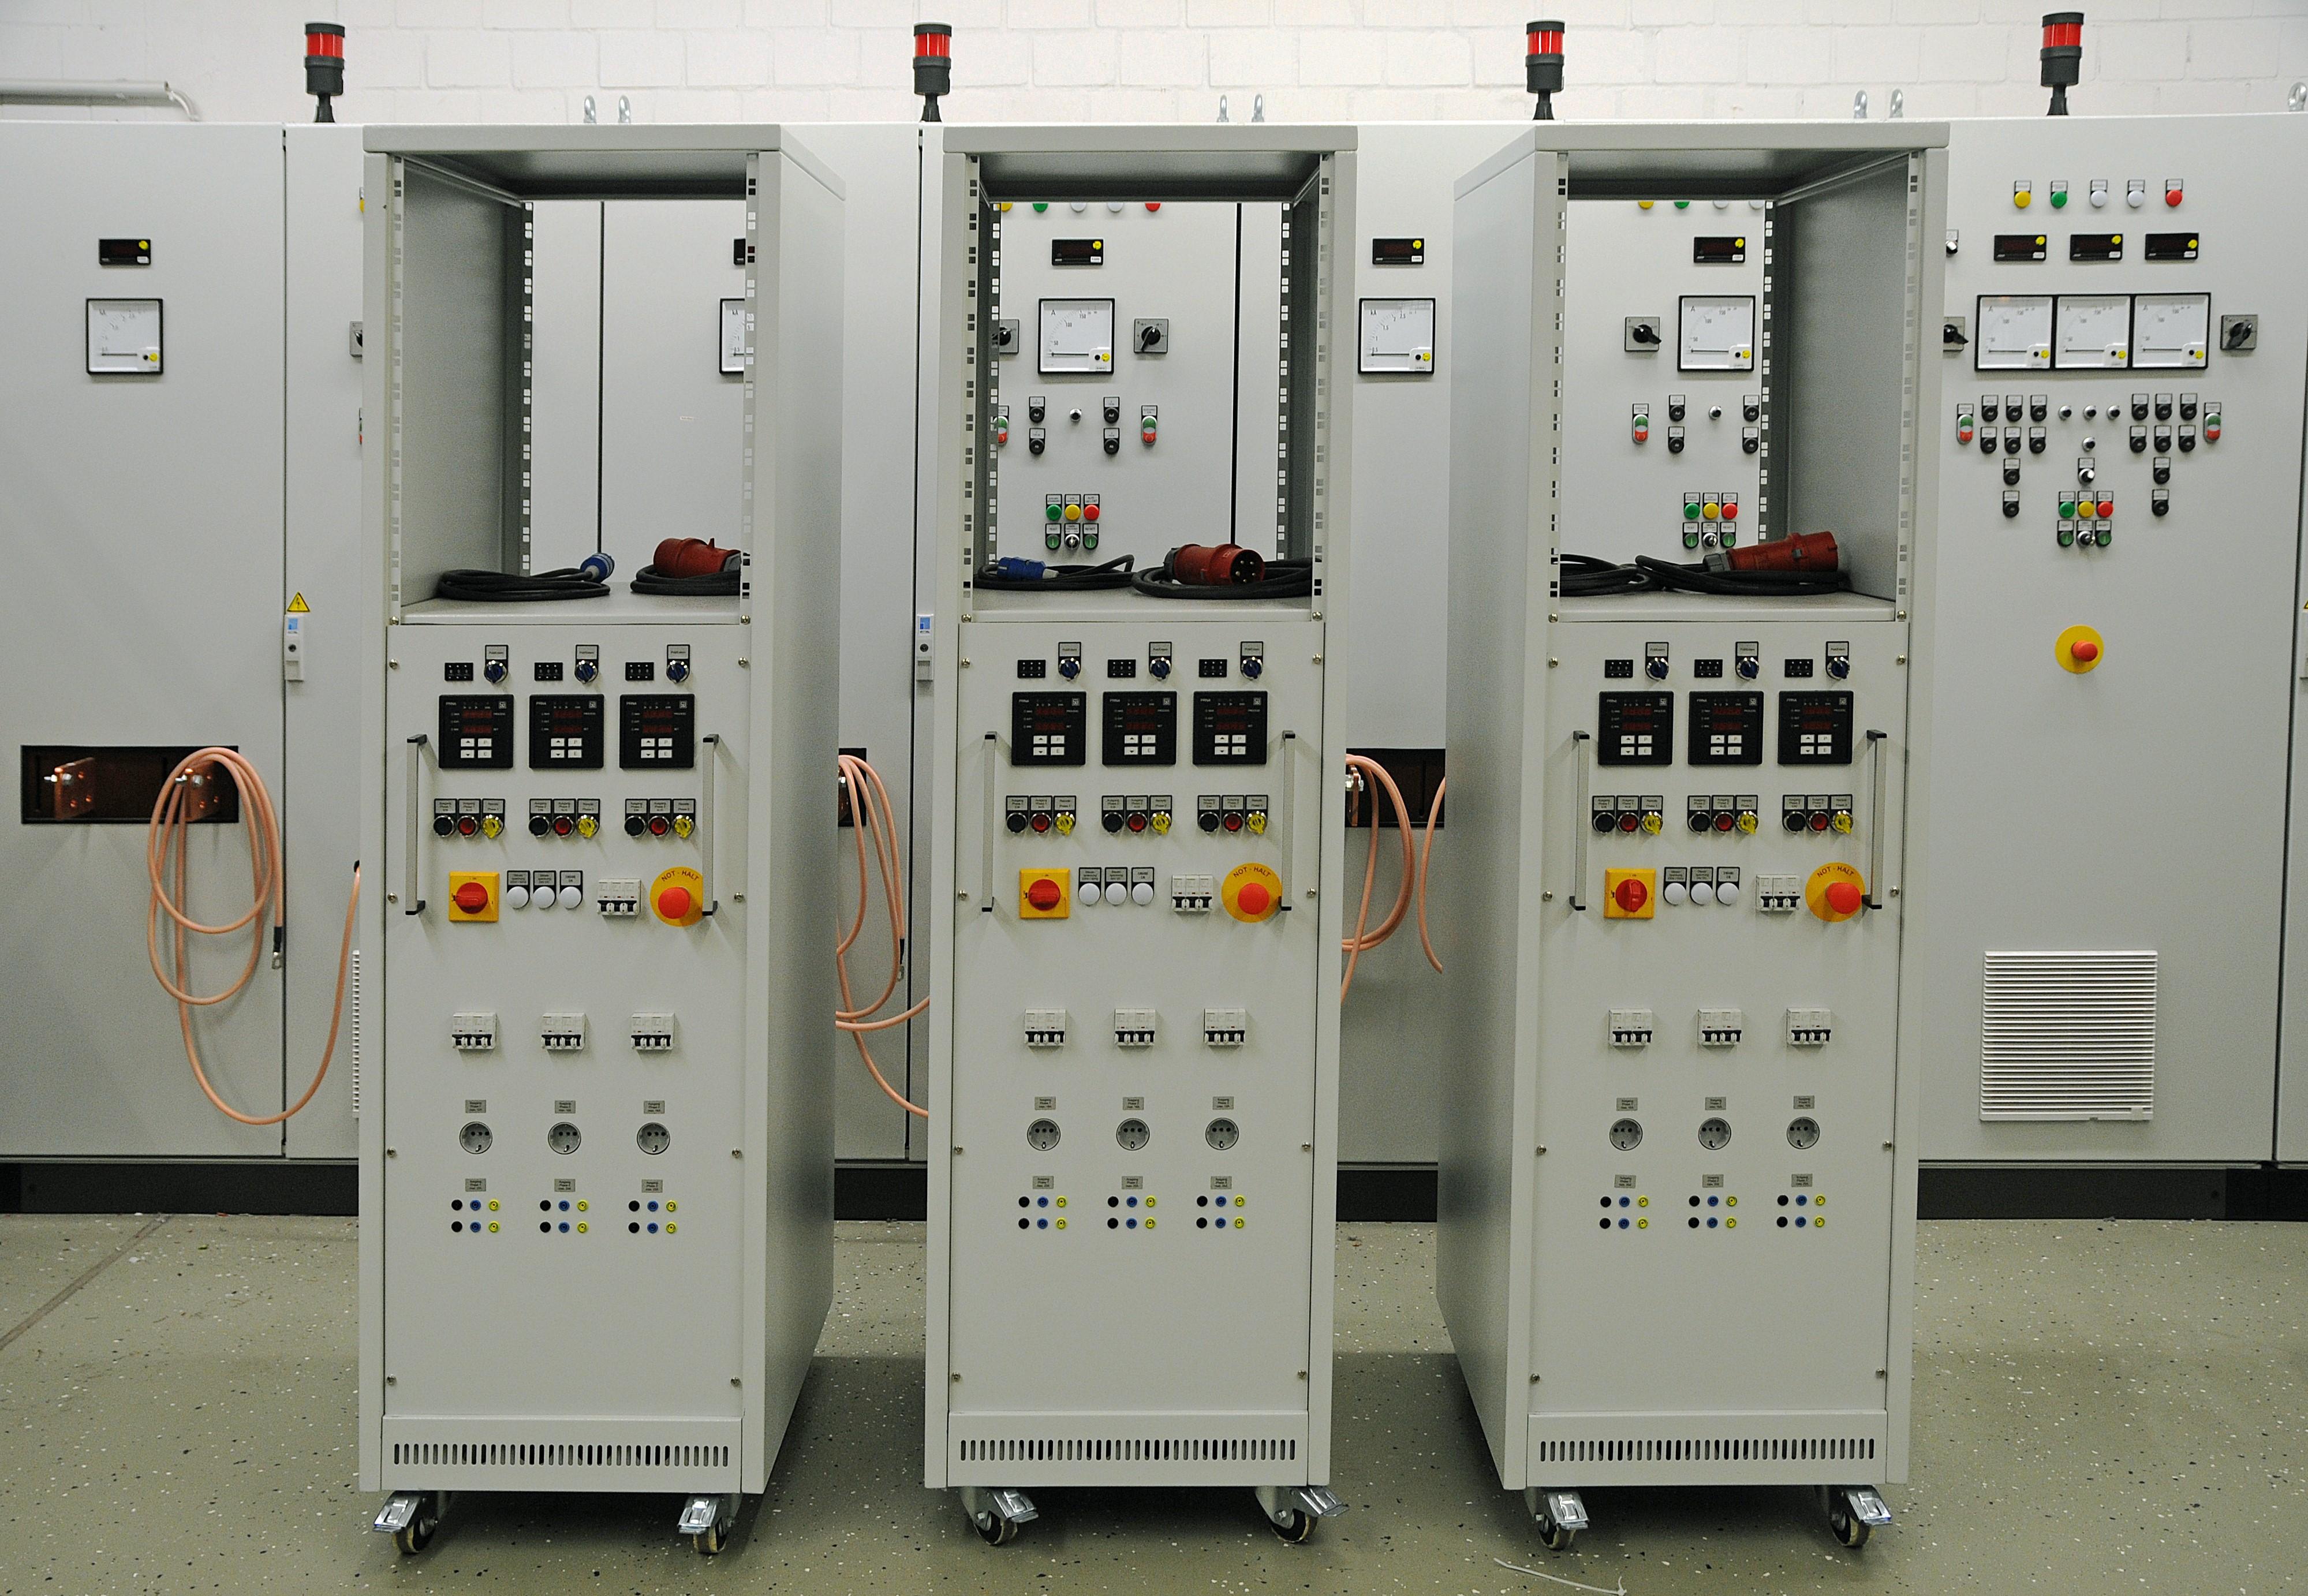 Bosch-Siemens-Hausgeräte [BSH]